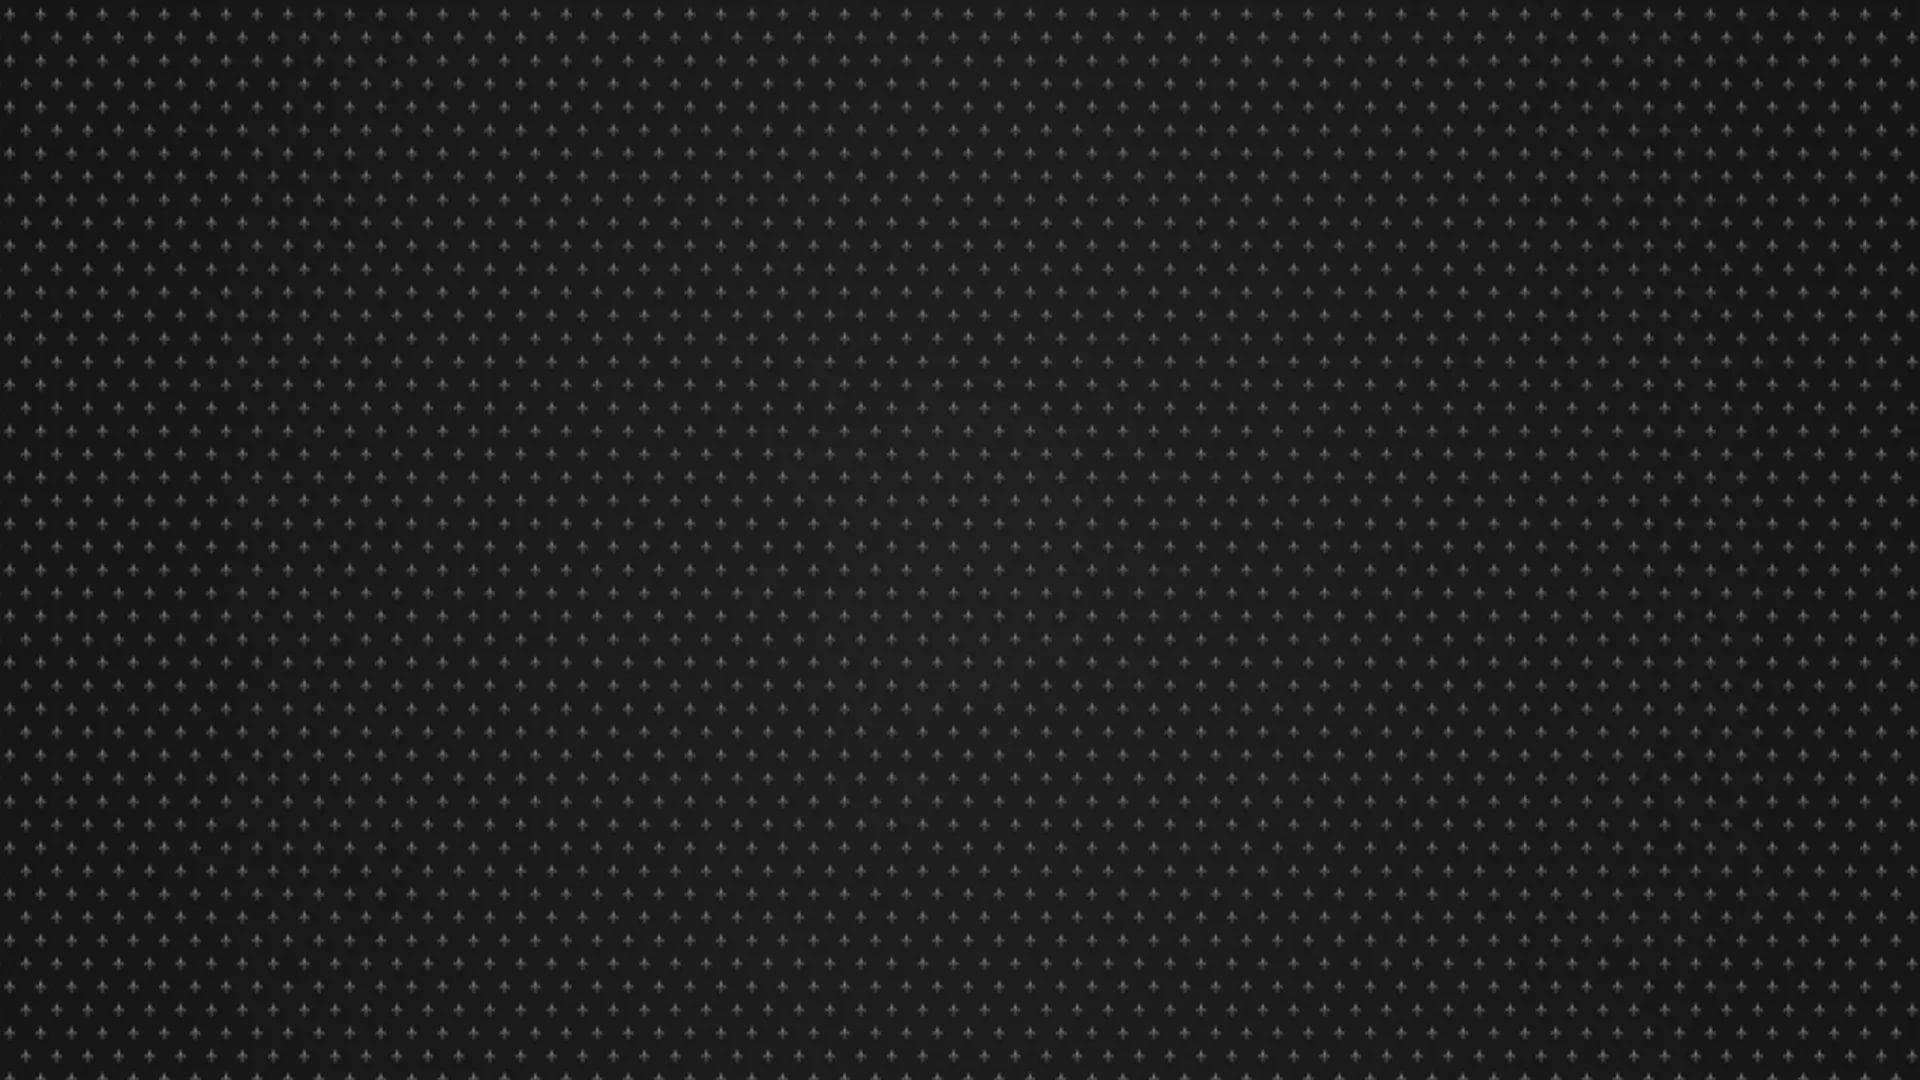 Plain Black Background Wallpaper HD